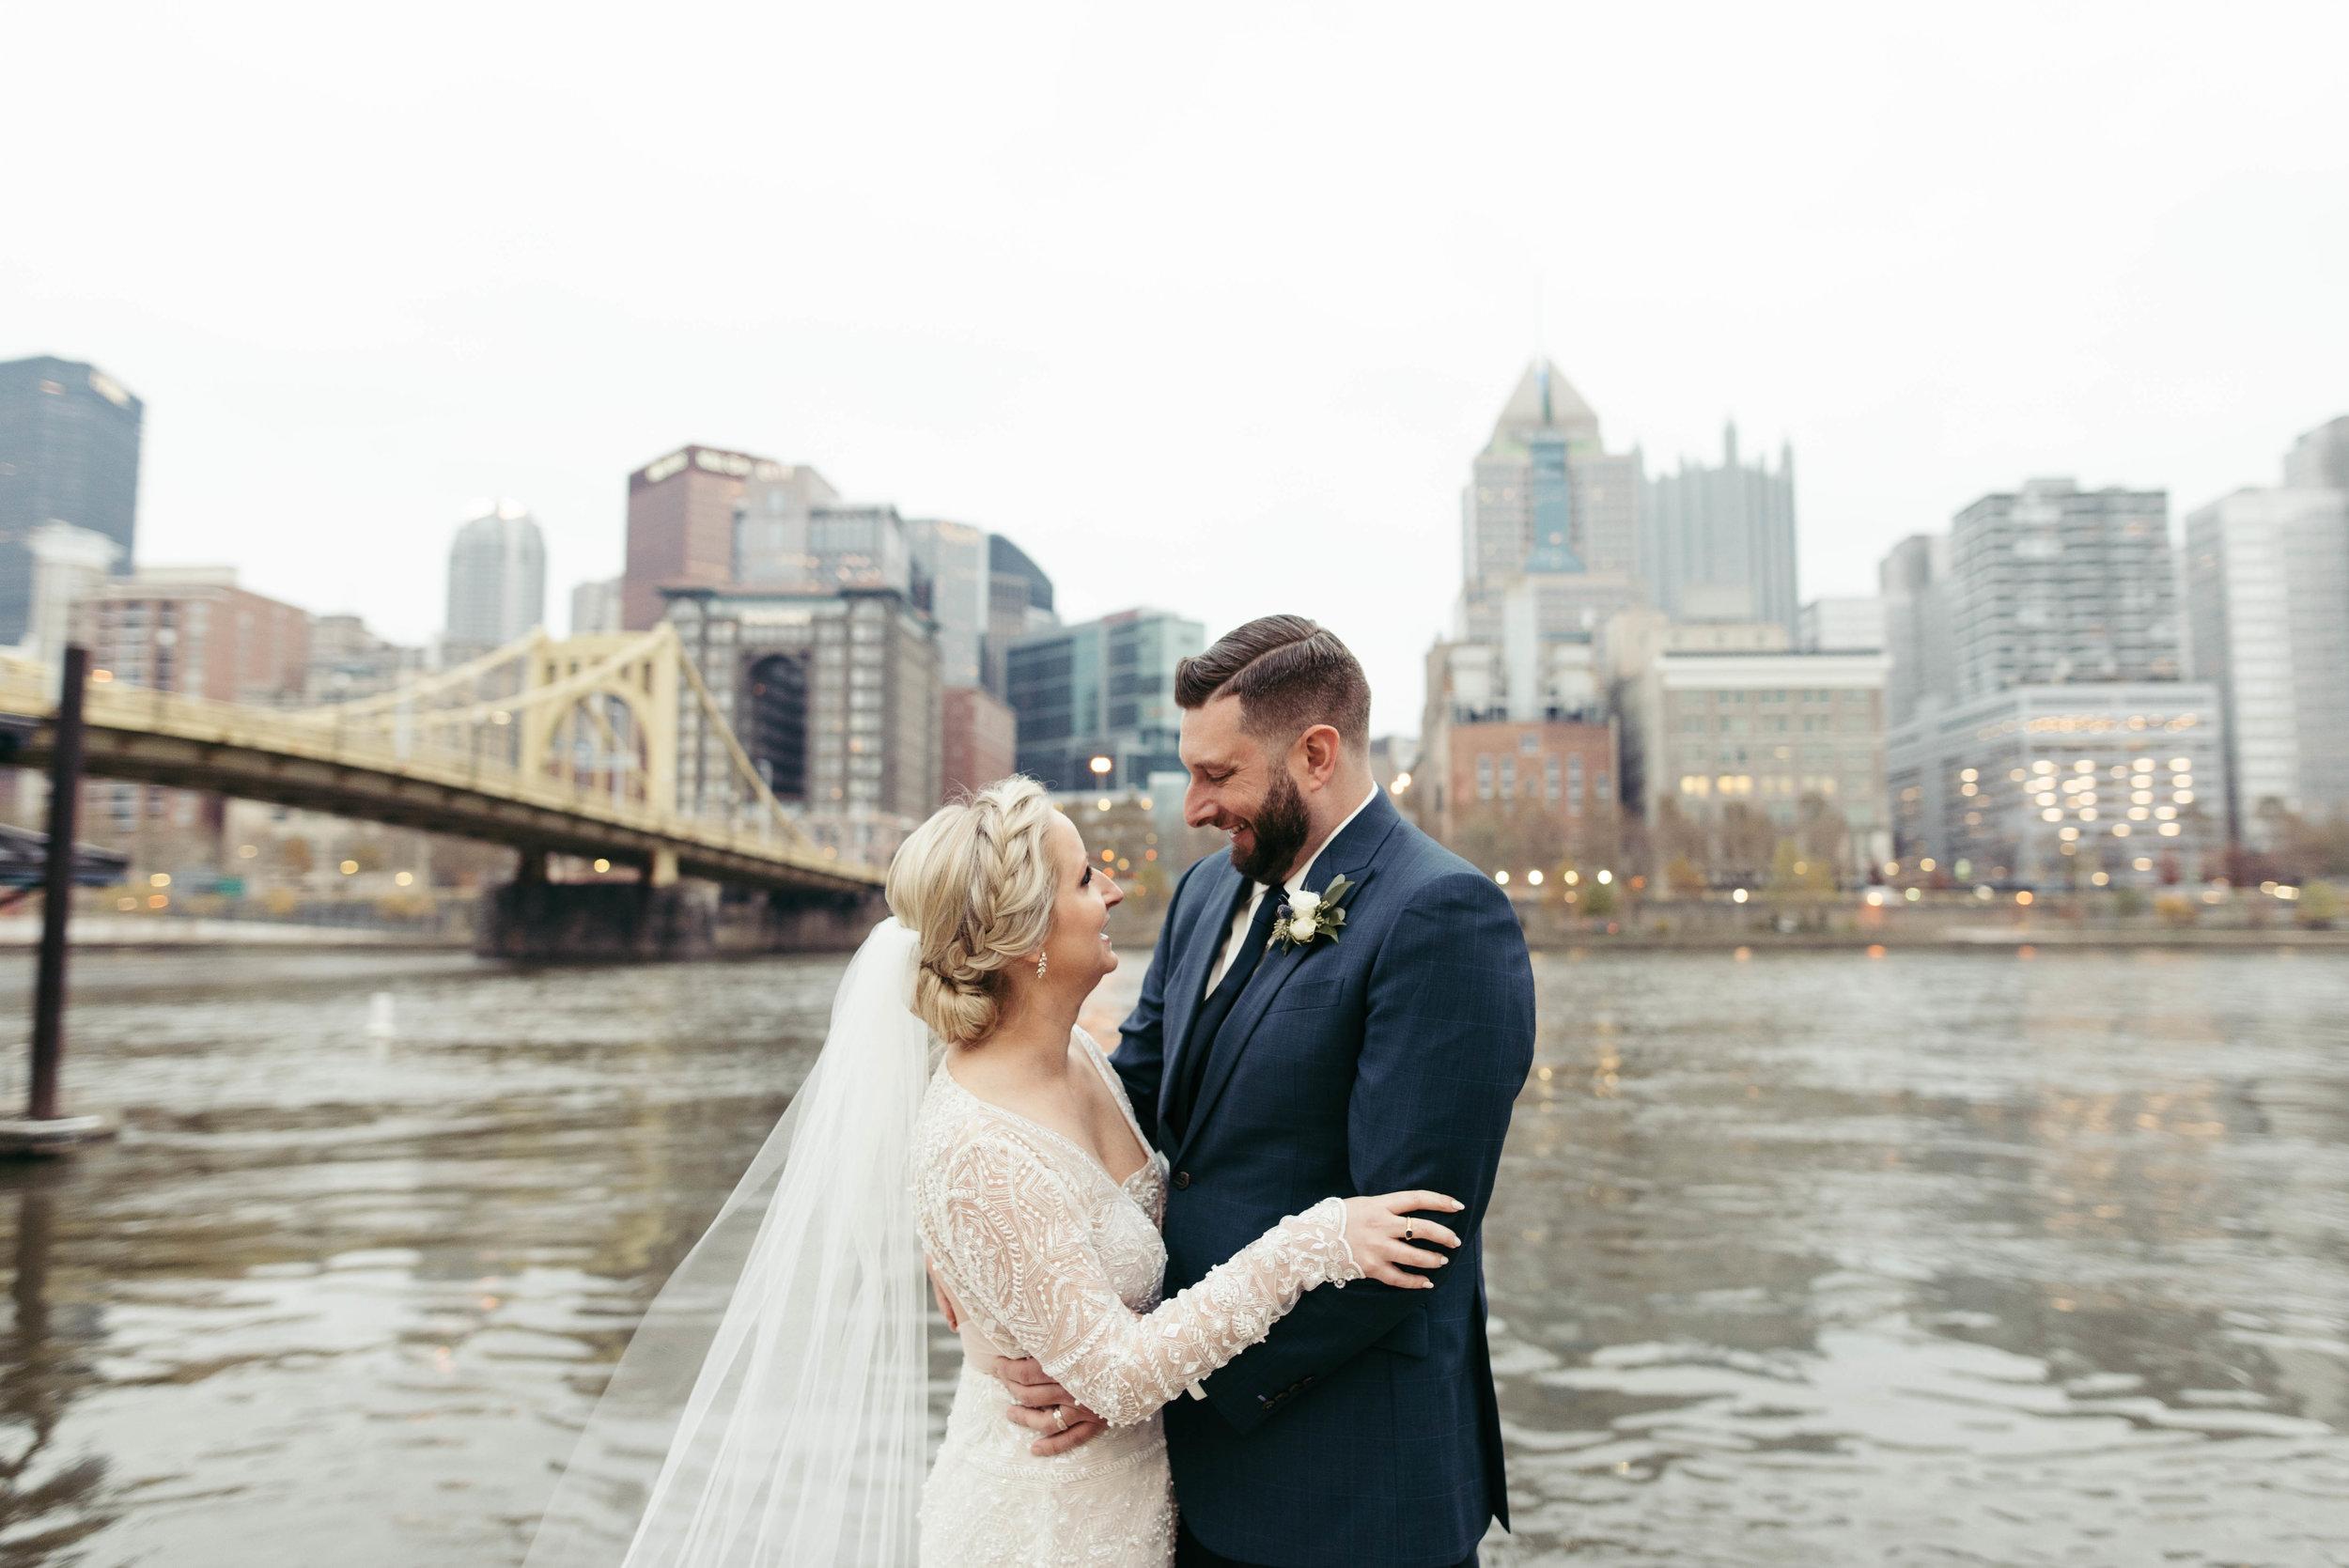 renaissance hotel wedding photos-41.jpg